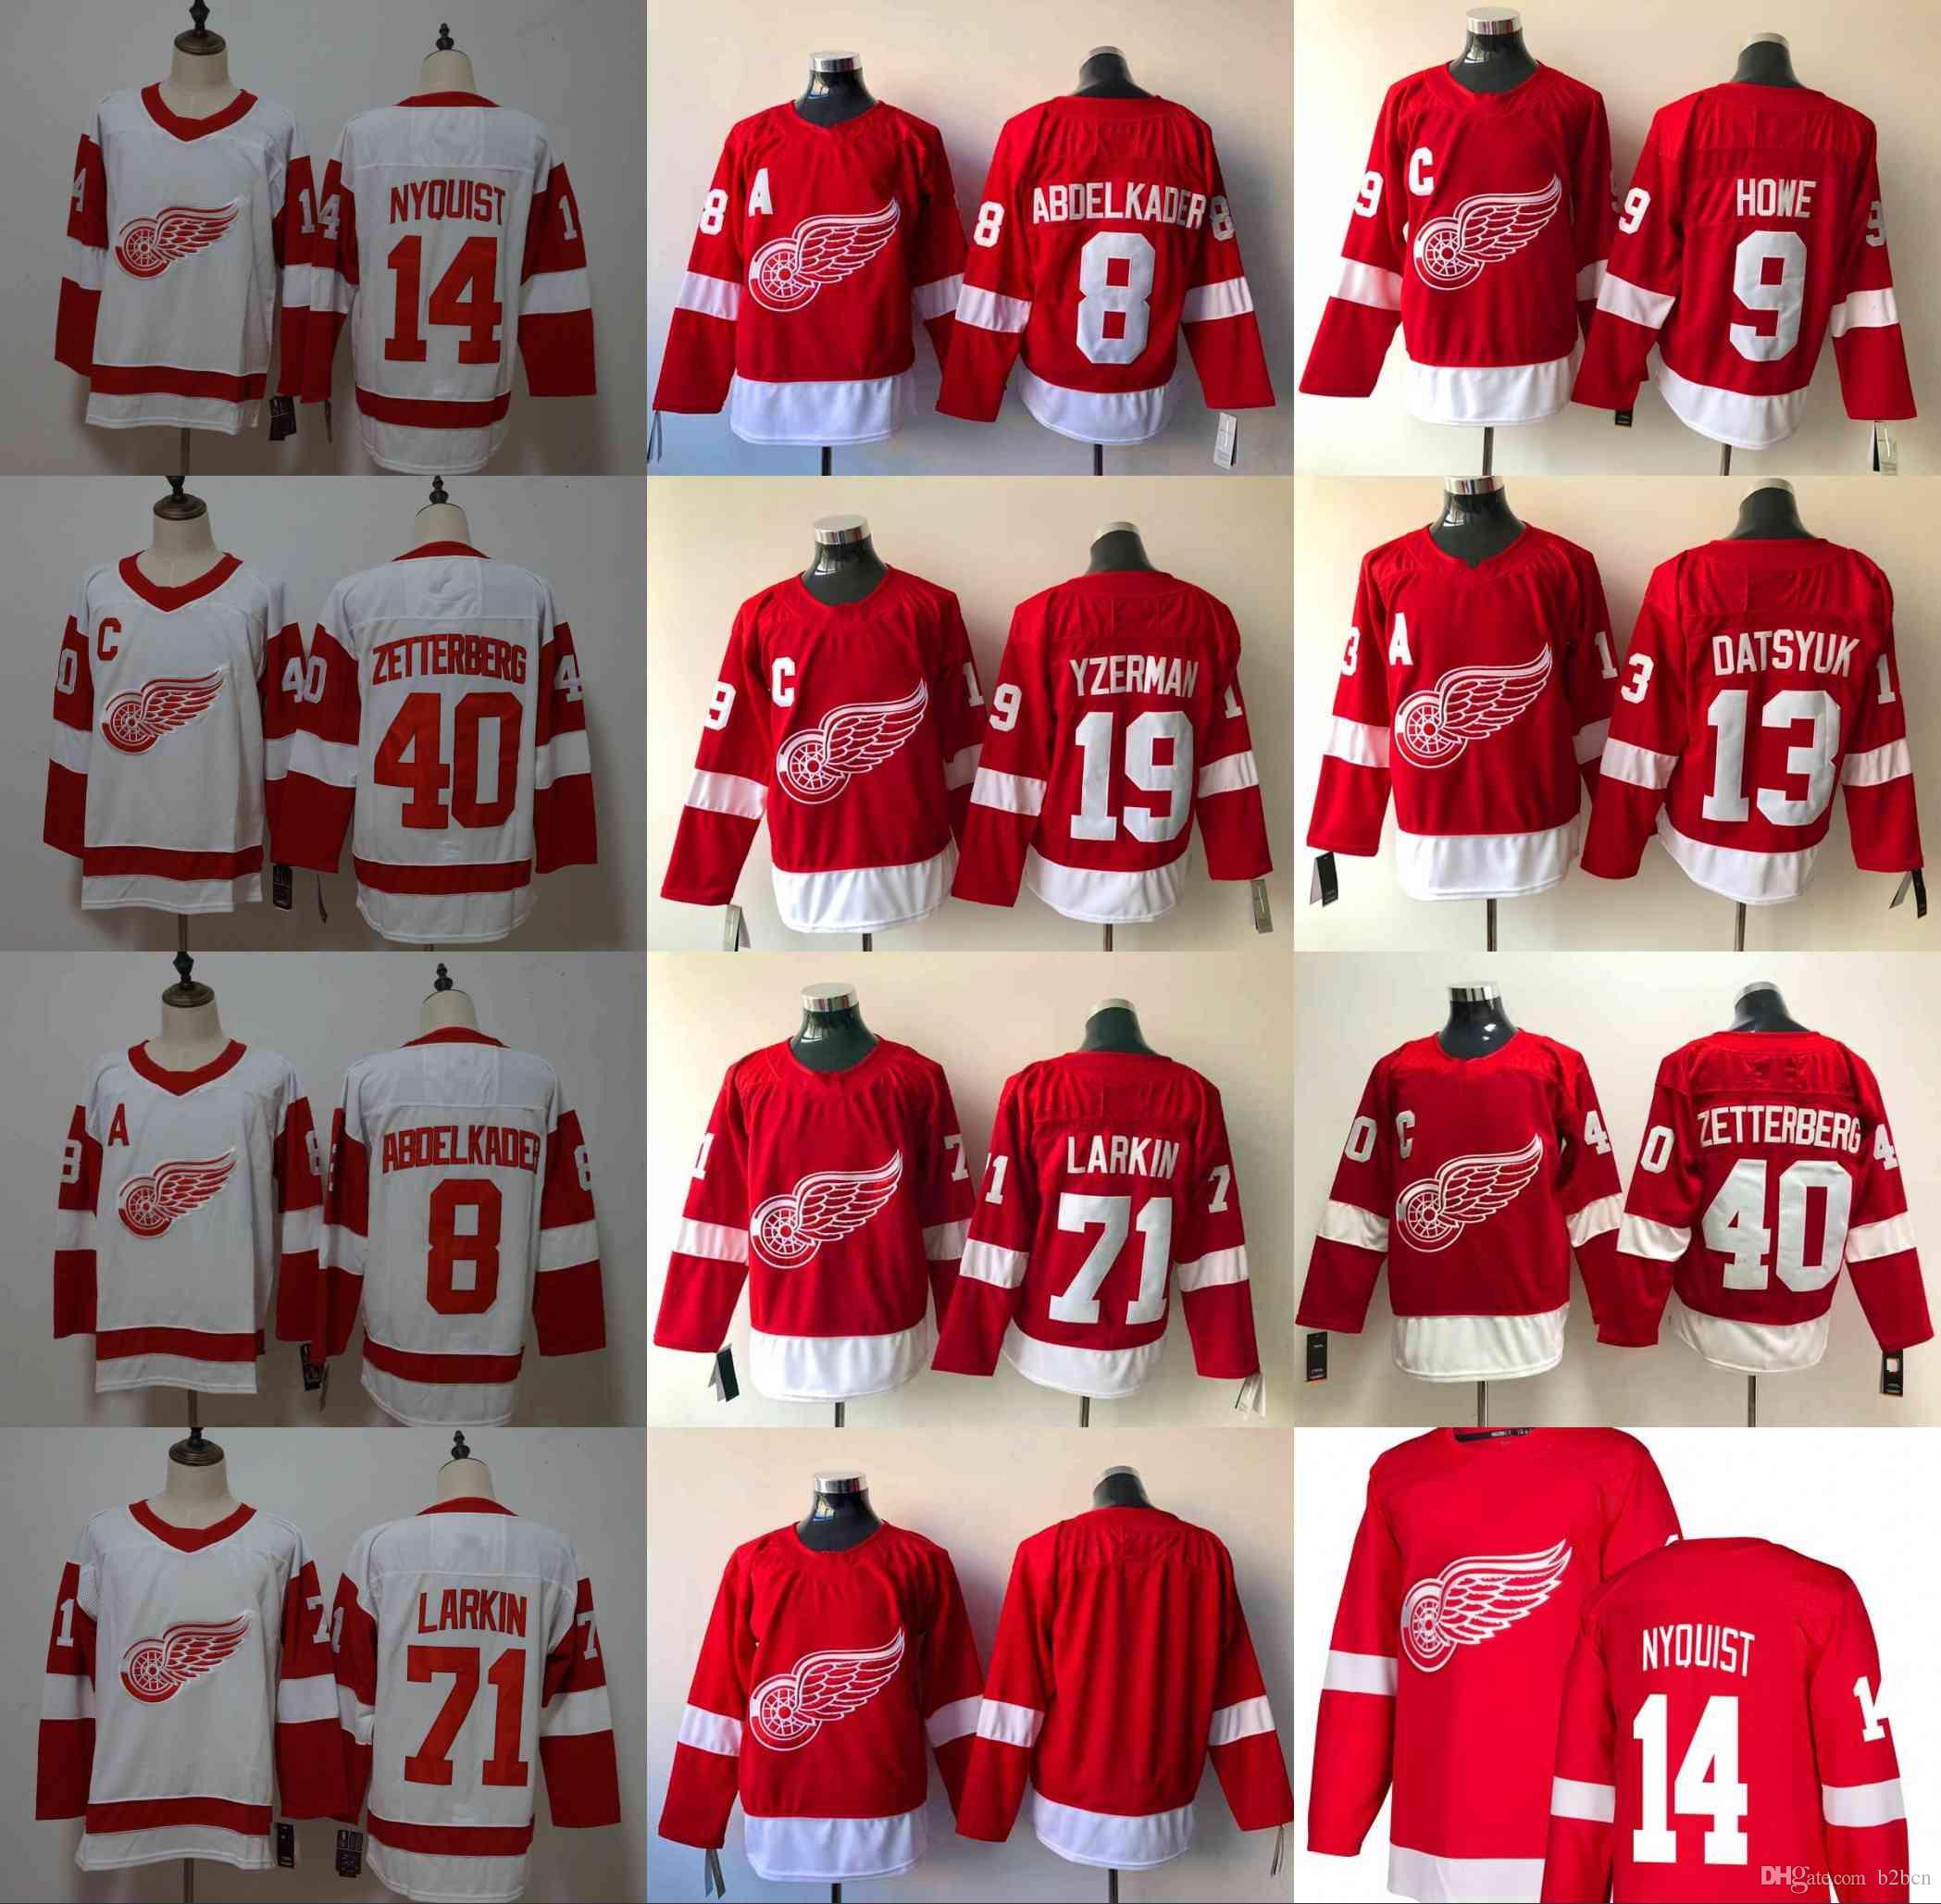 2019 Detroit Red Wings 71 Dylan Larkin 8 Justin Abdelkader 9 Gordie Howe 40  Henrik Zetterberg 19 Steve Yzerman 13 Pavel Datsyuk Hockey Jersey From  B2bcn 16e6e4154